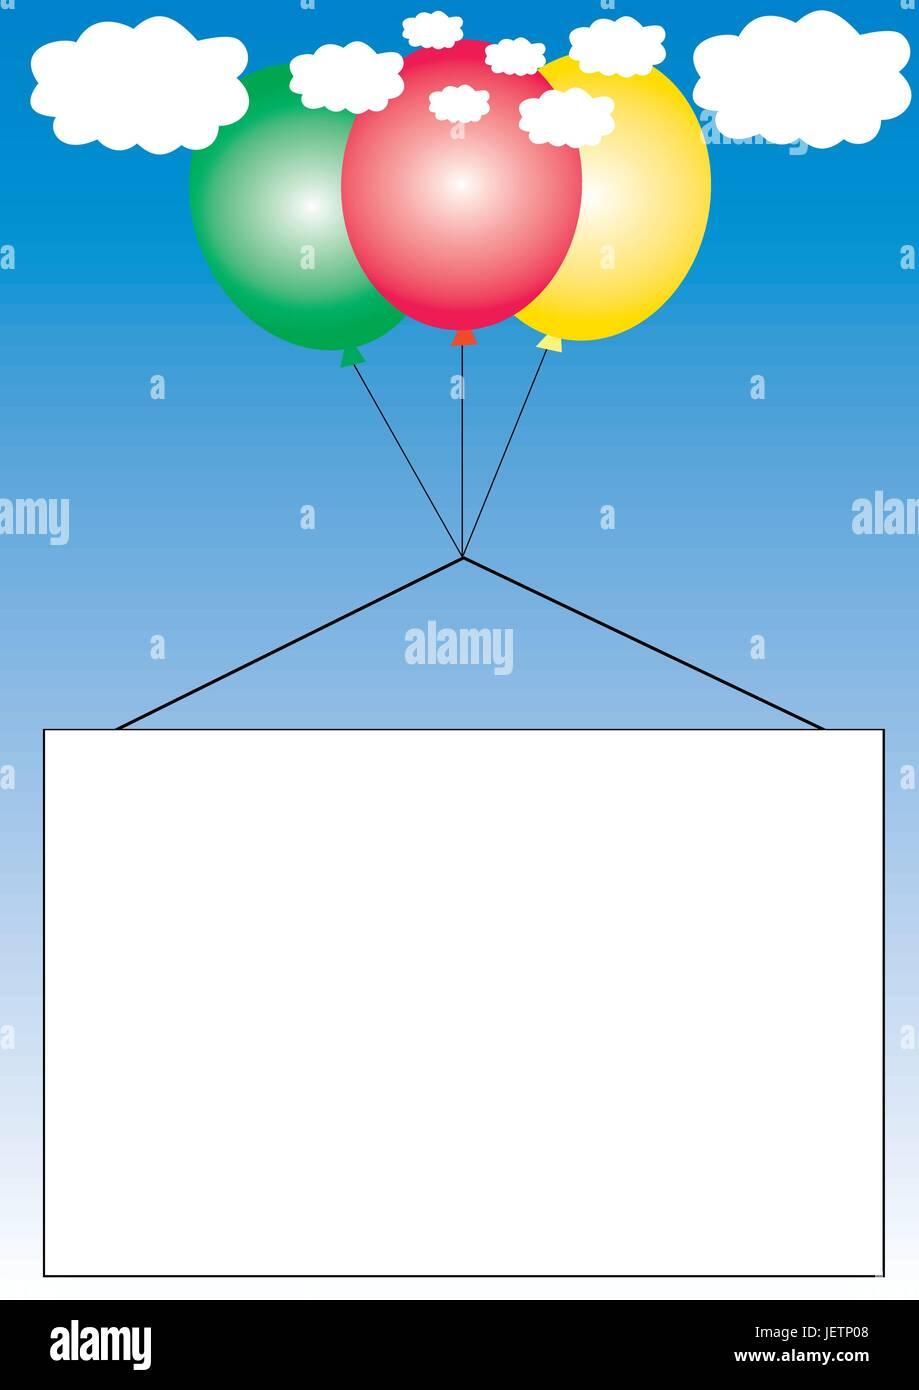 blue, print, banner, advertisement, balloons, ballon, floating, clouds, - Stock Vector